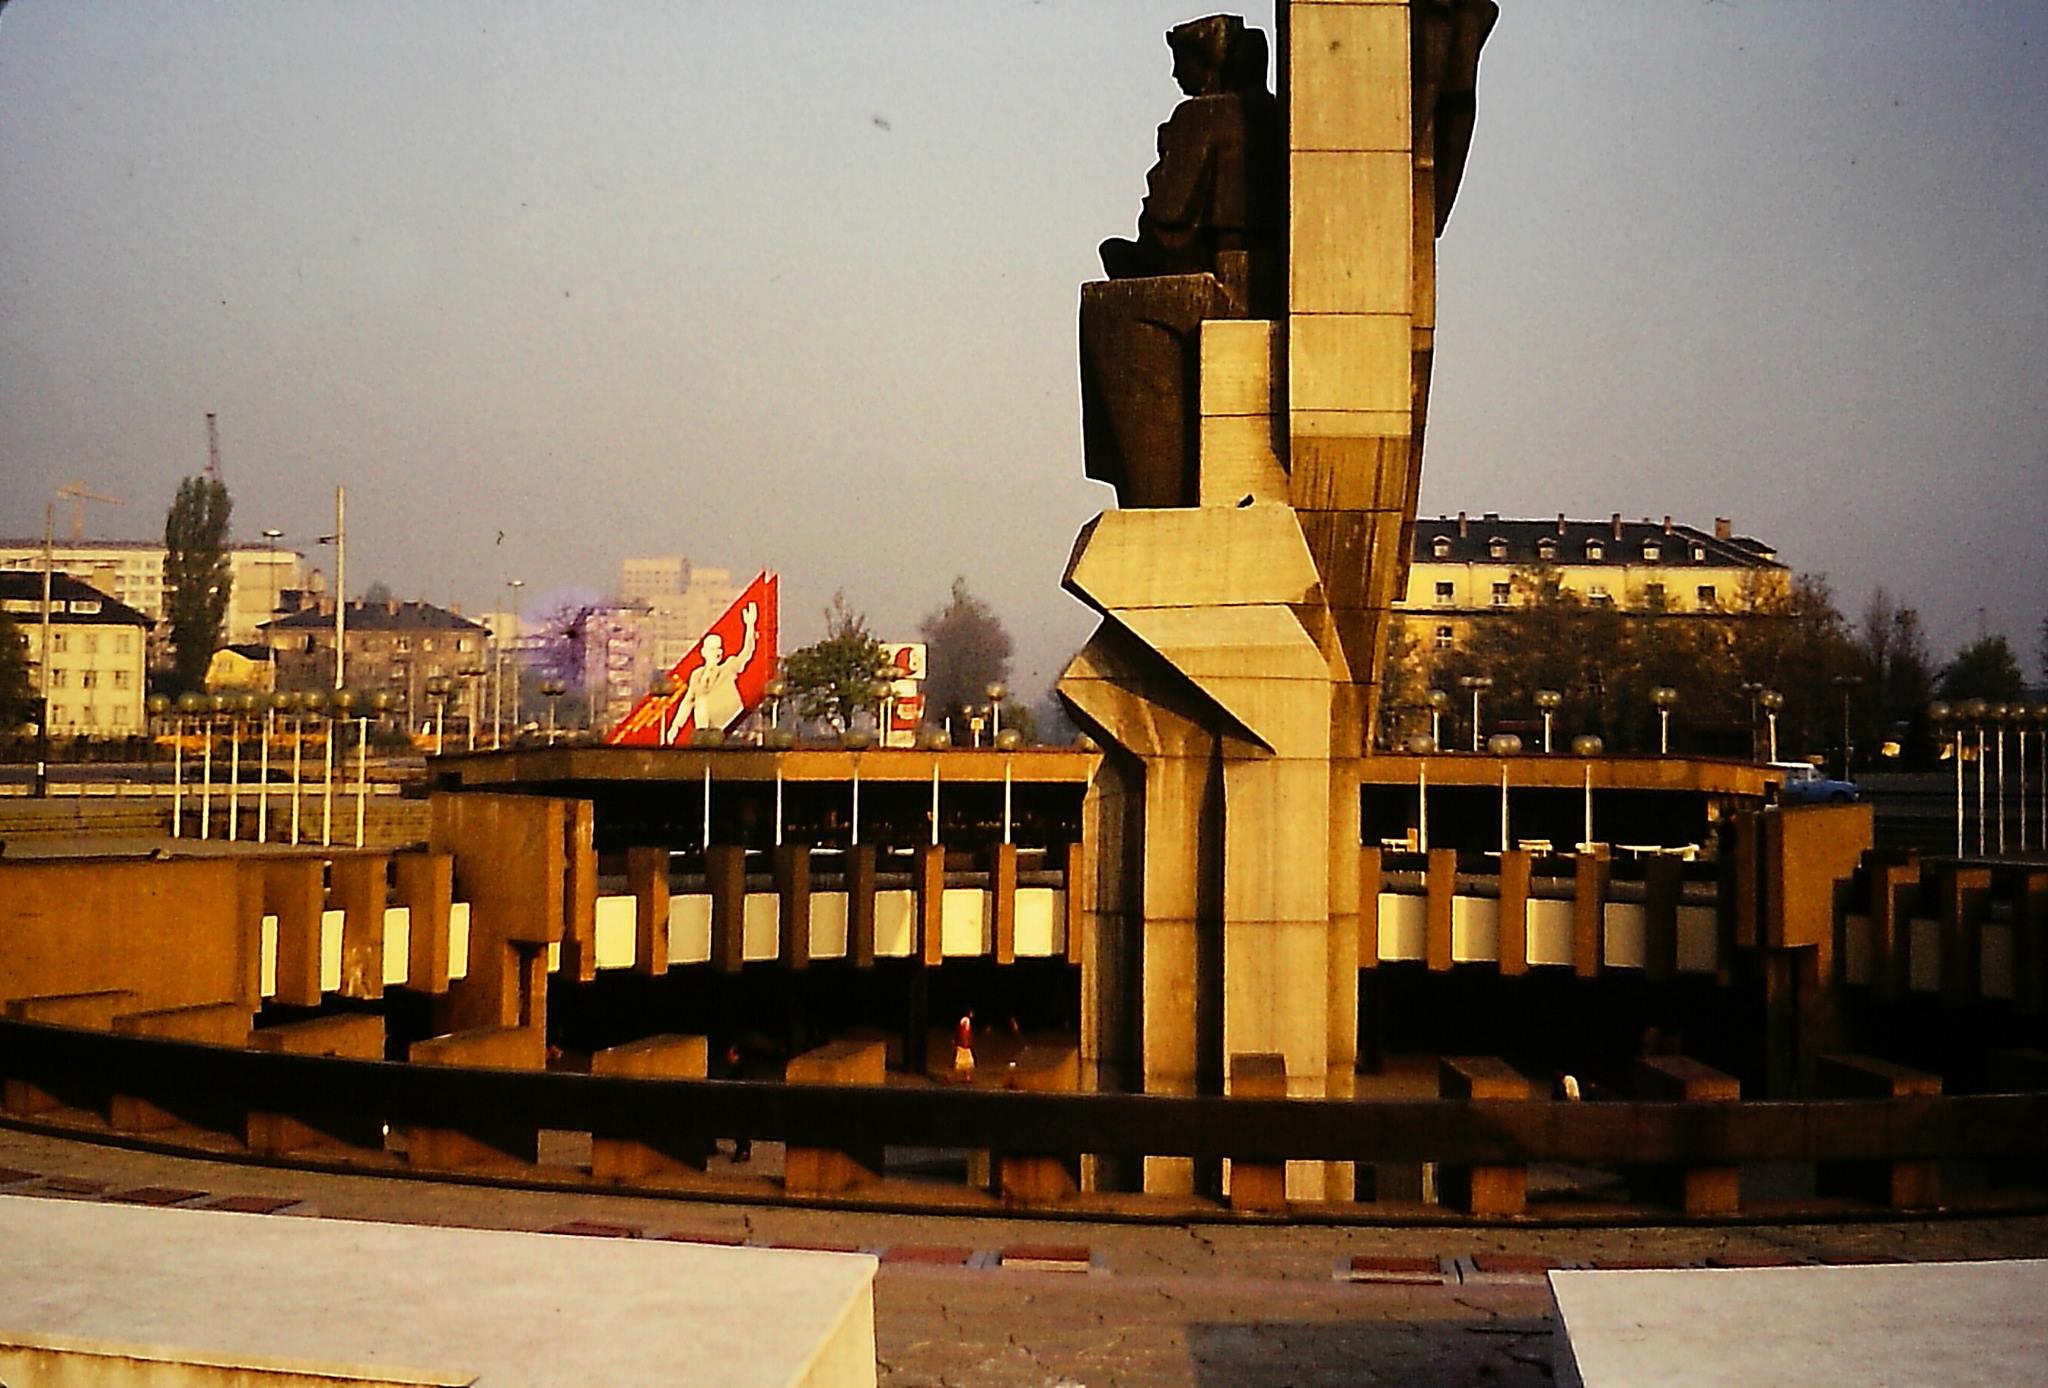 BULG 1a Sofia Station